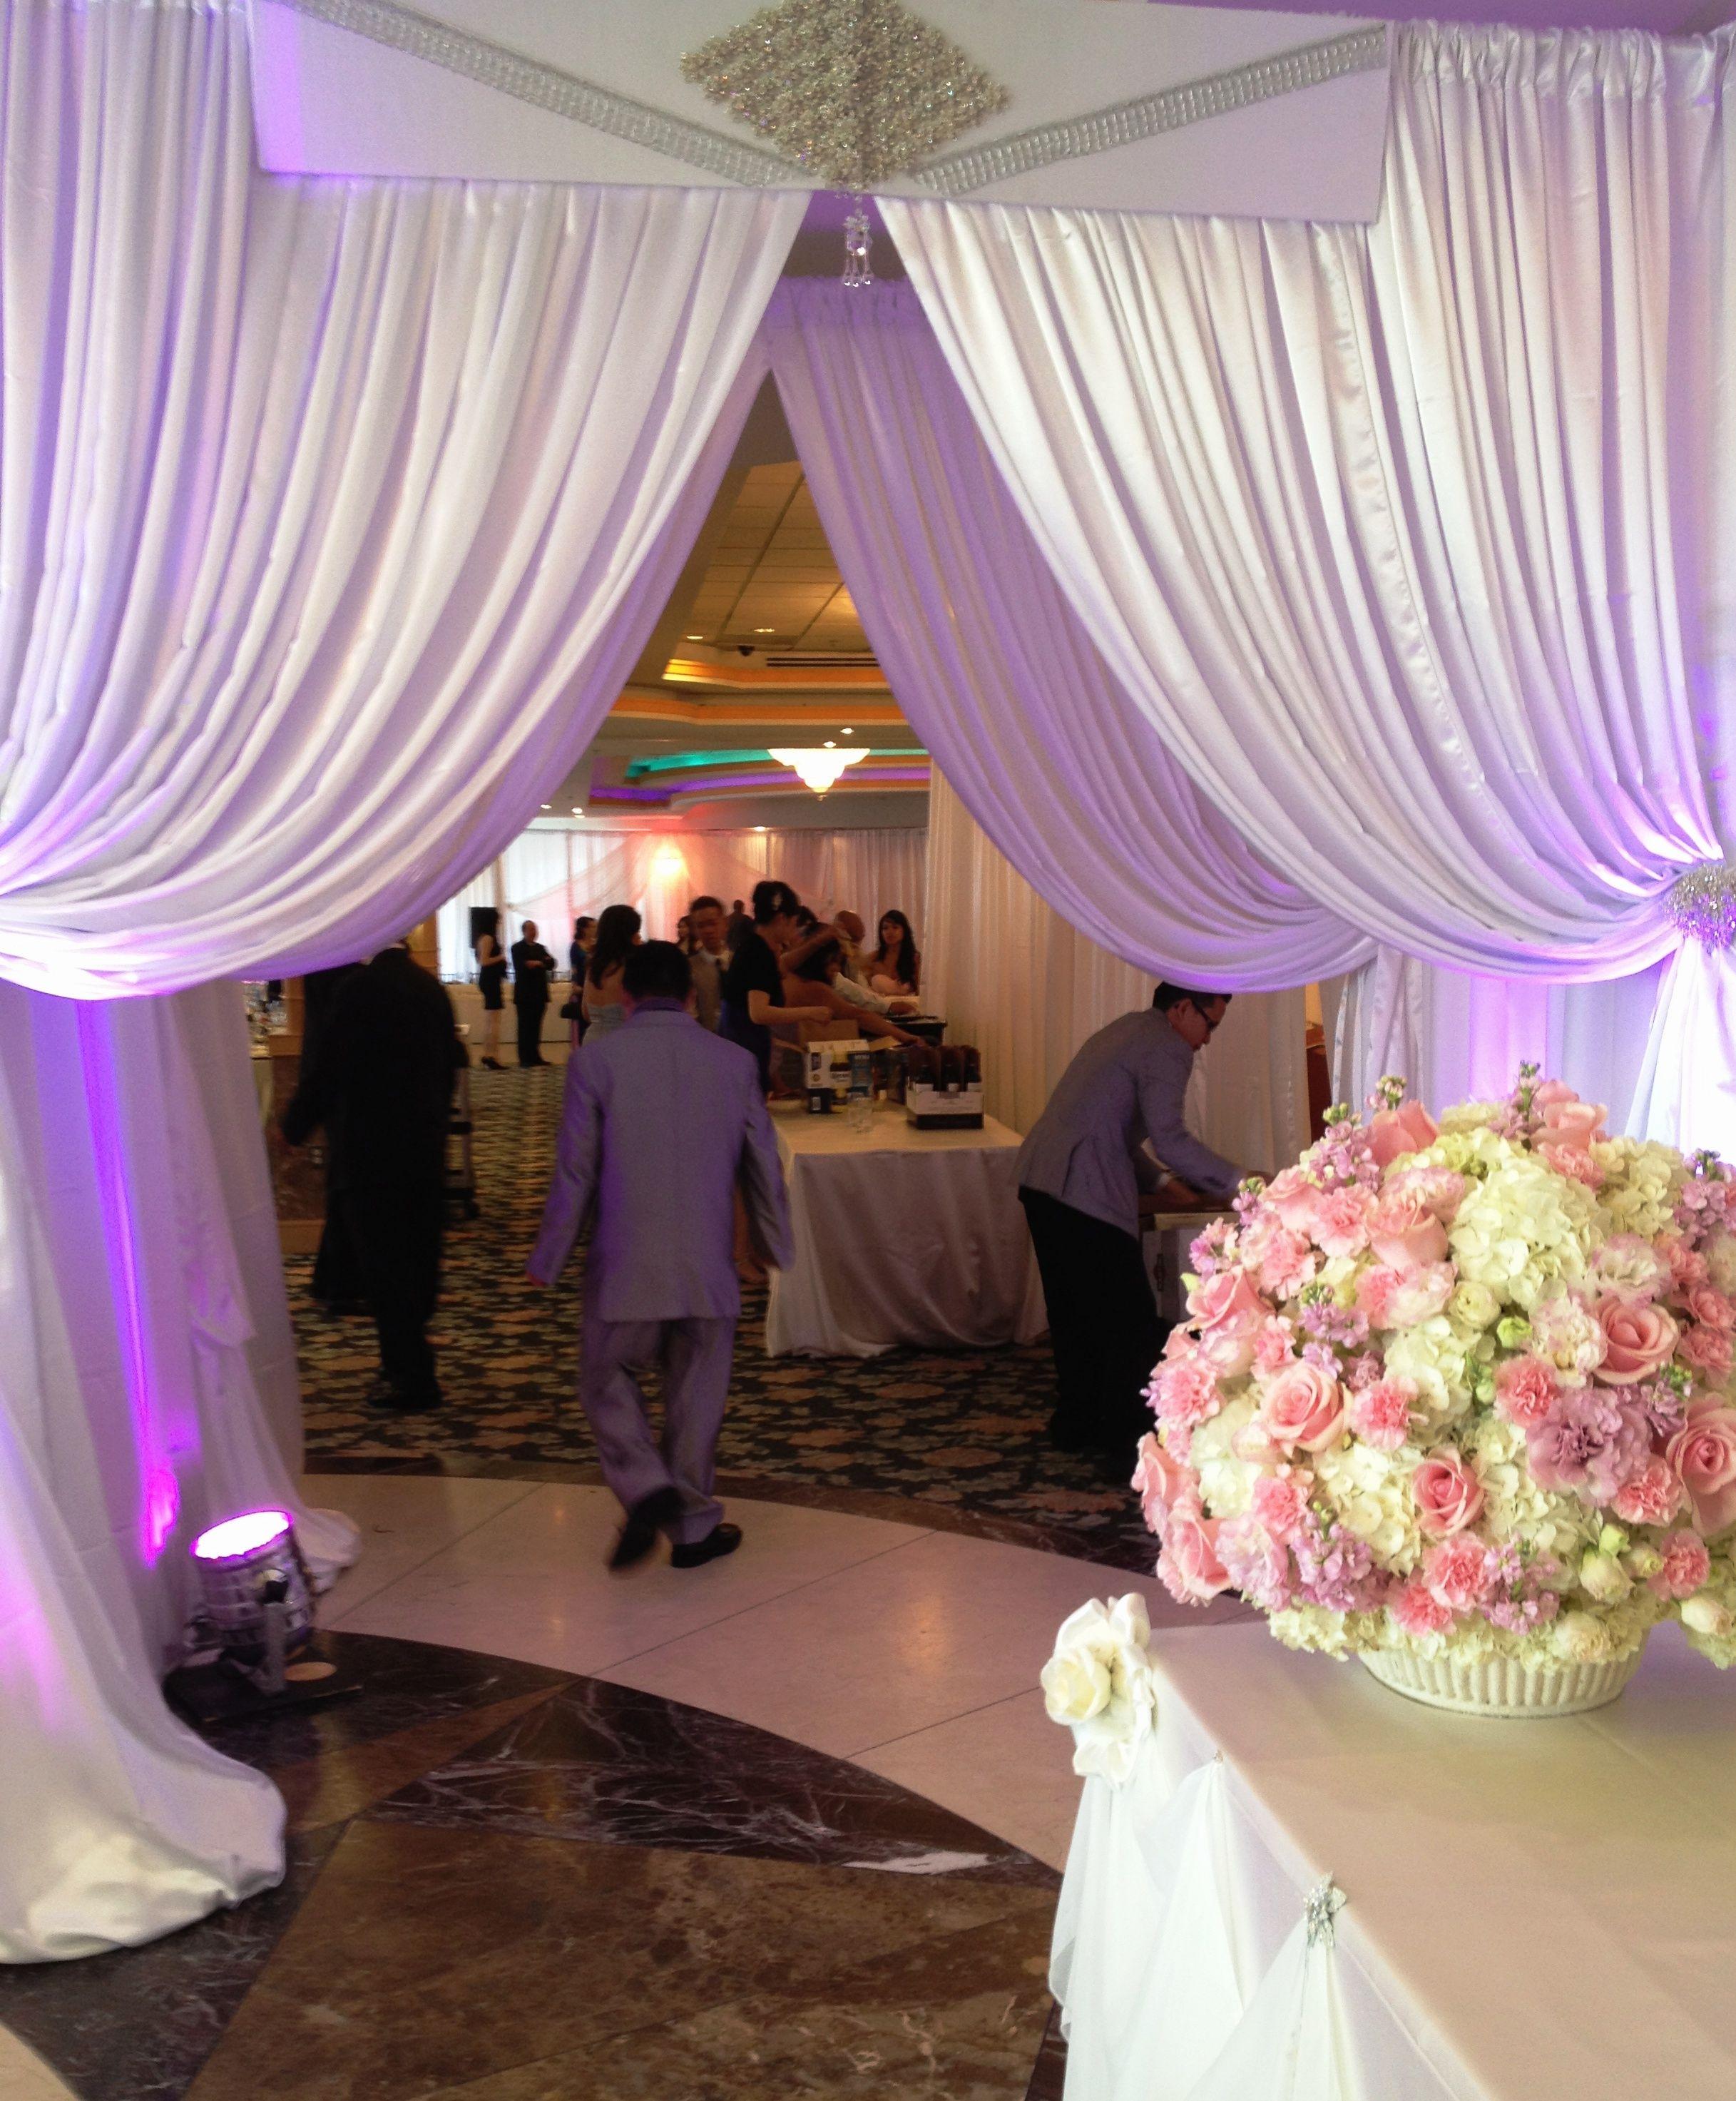 Cheap Wedding Venues Bay Area Ca: Diamond Entrance To Wedding Reception At San Jose Dynasty